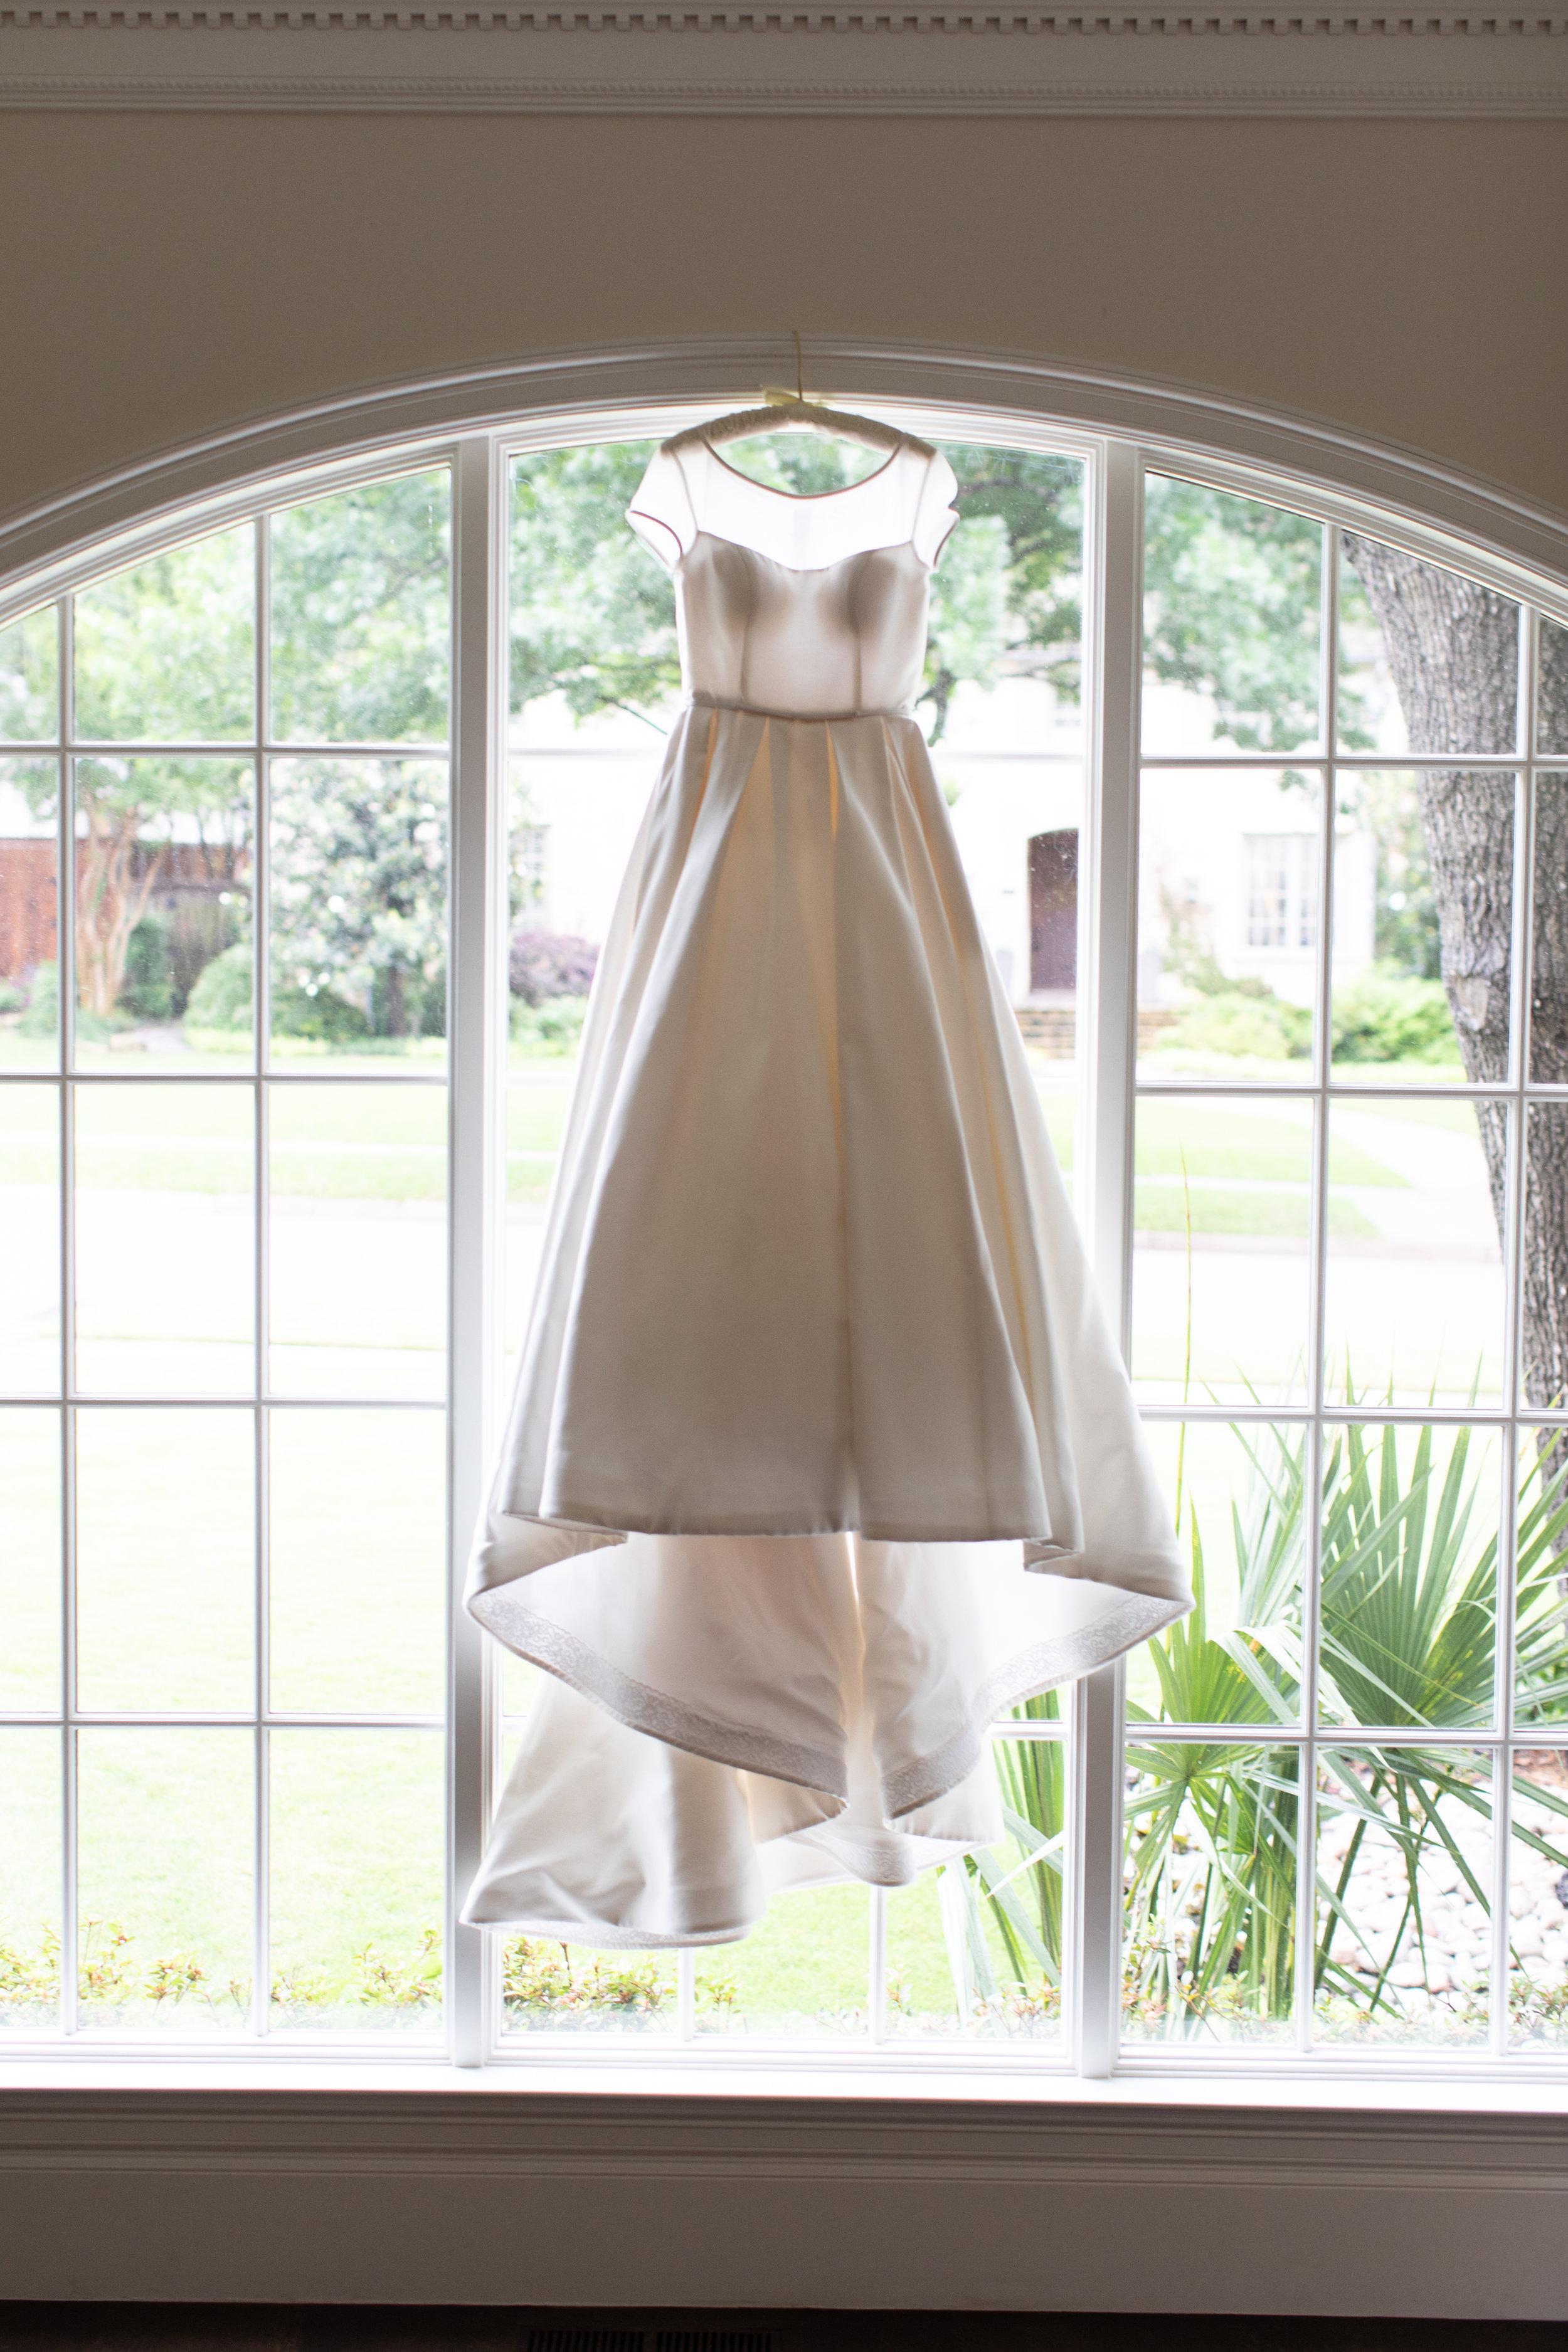 Ana-Dress-The-Dallas-Arboretum-Ivory-and-Vine.jpg